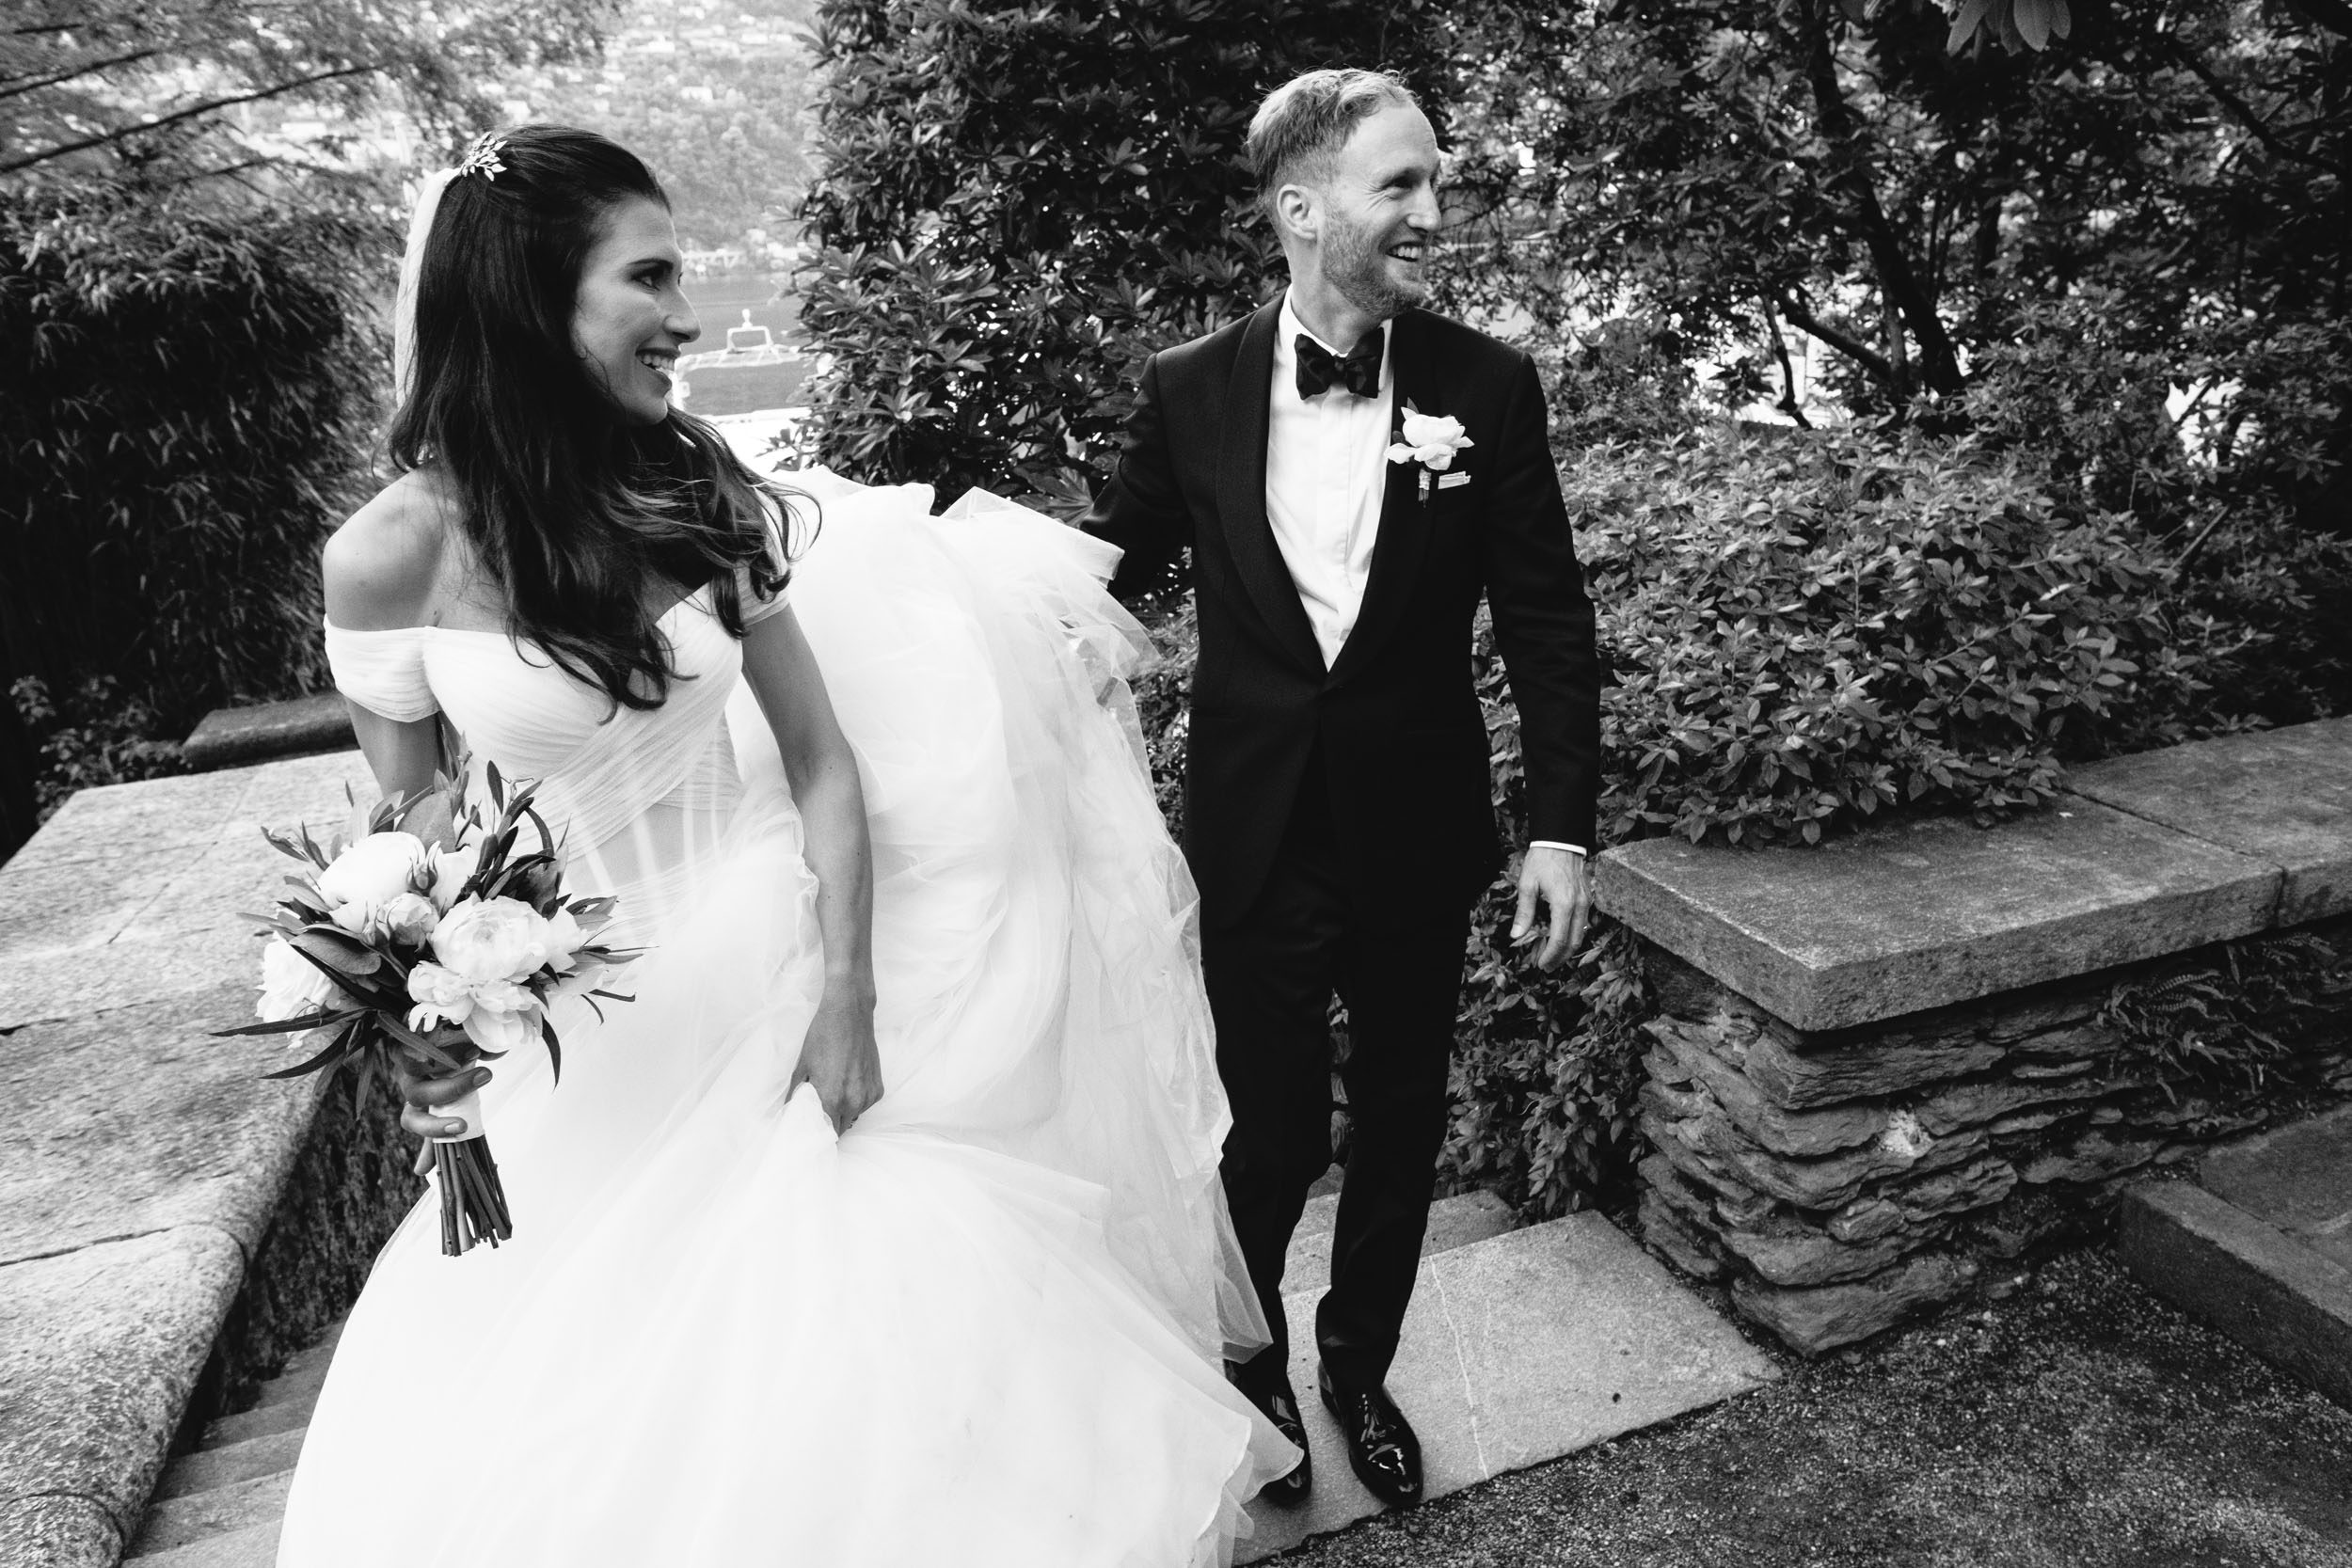 olivia-andreas-wedding-switzerland-384.jpg